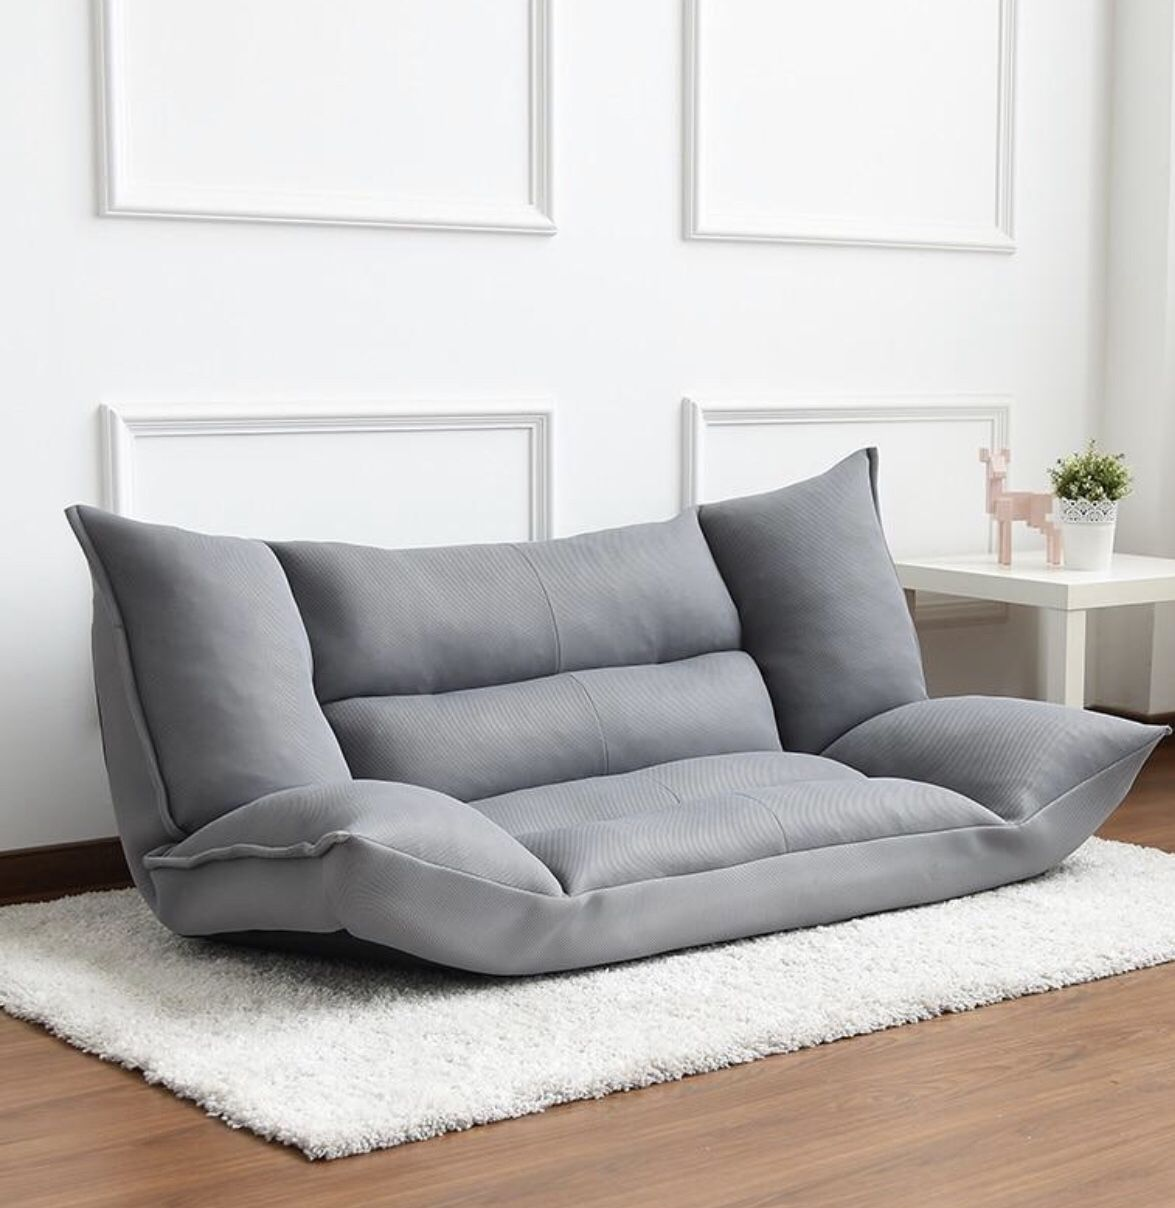 This Modern Floor Cushion Sofa Is Made